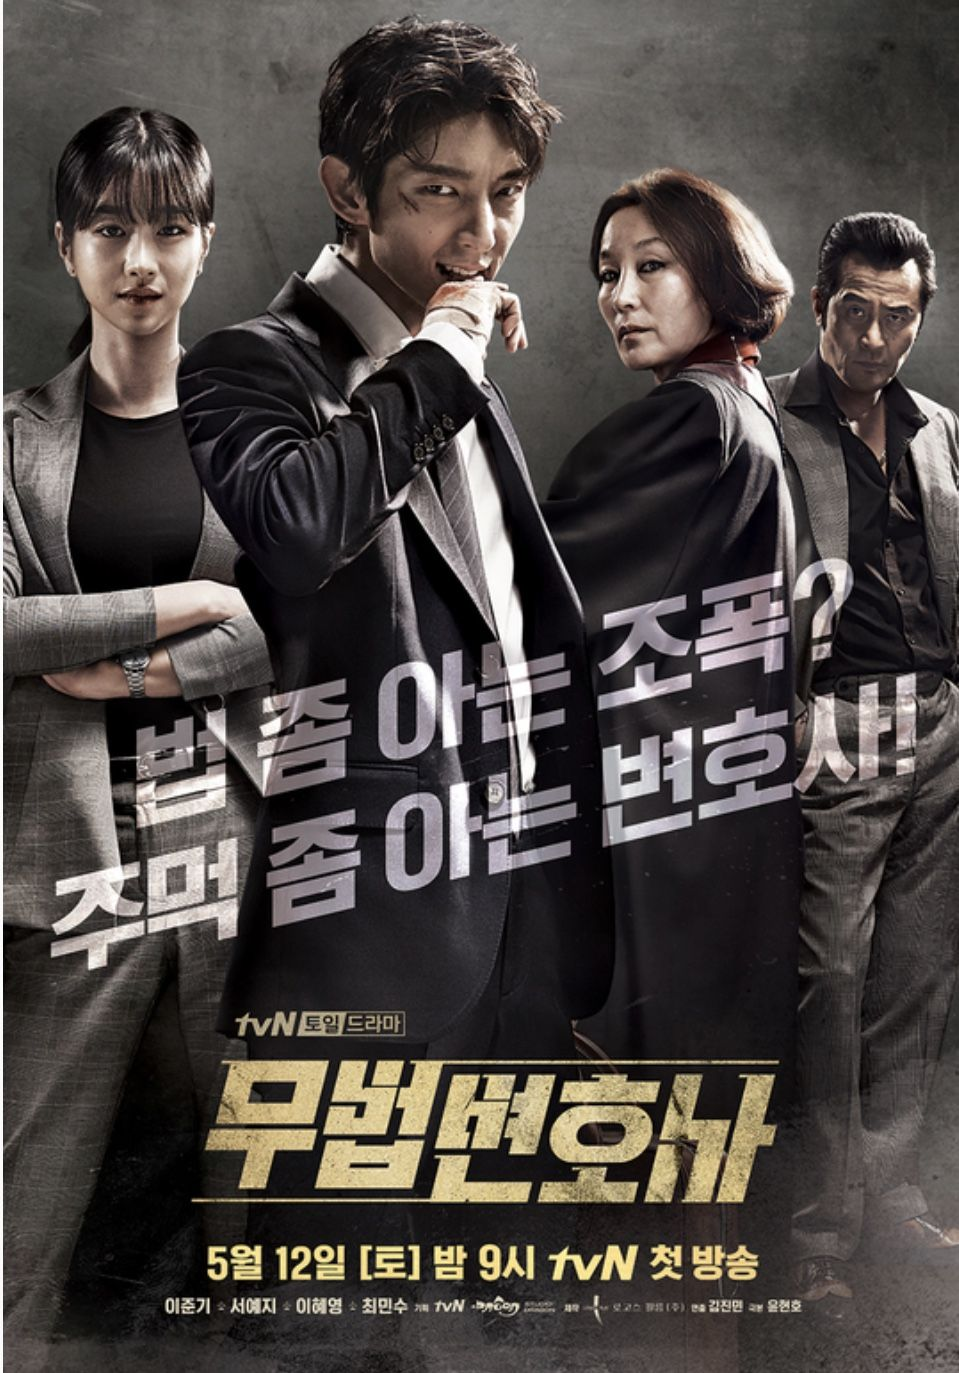 Lawless Lawyer Korean Drama Korean Drama Online Drama Korea